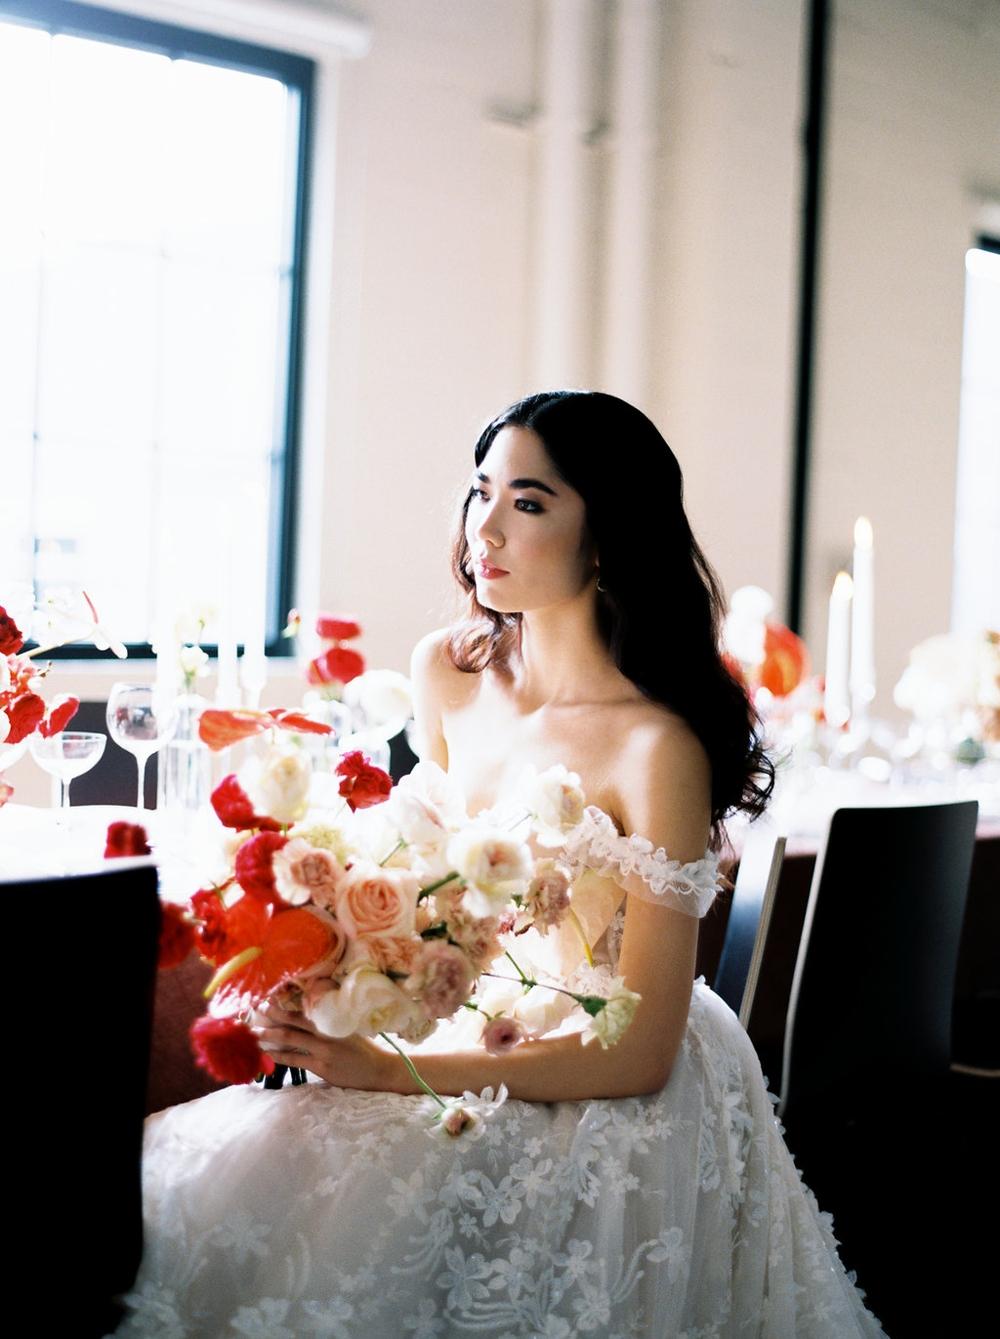 editorial-session-seattle-flower-stylist 12.jpg